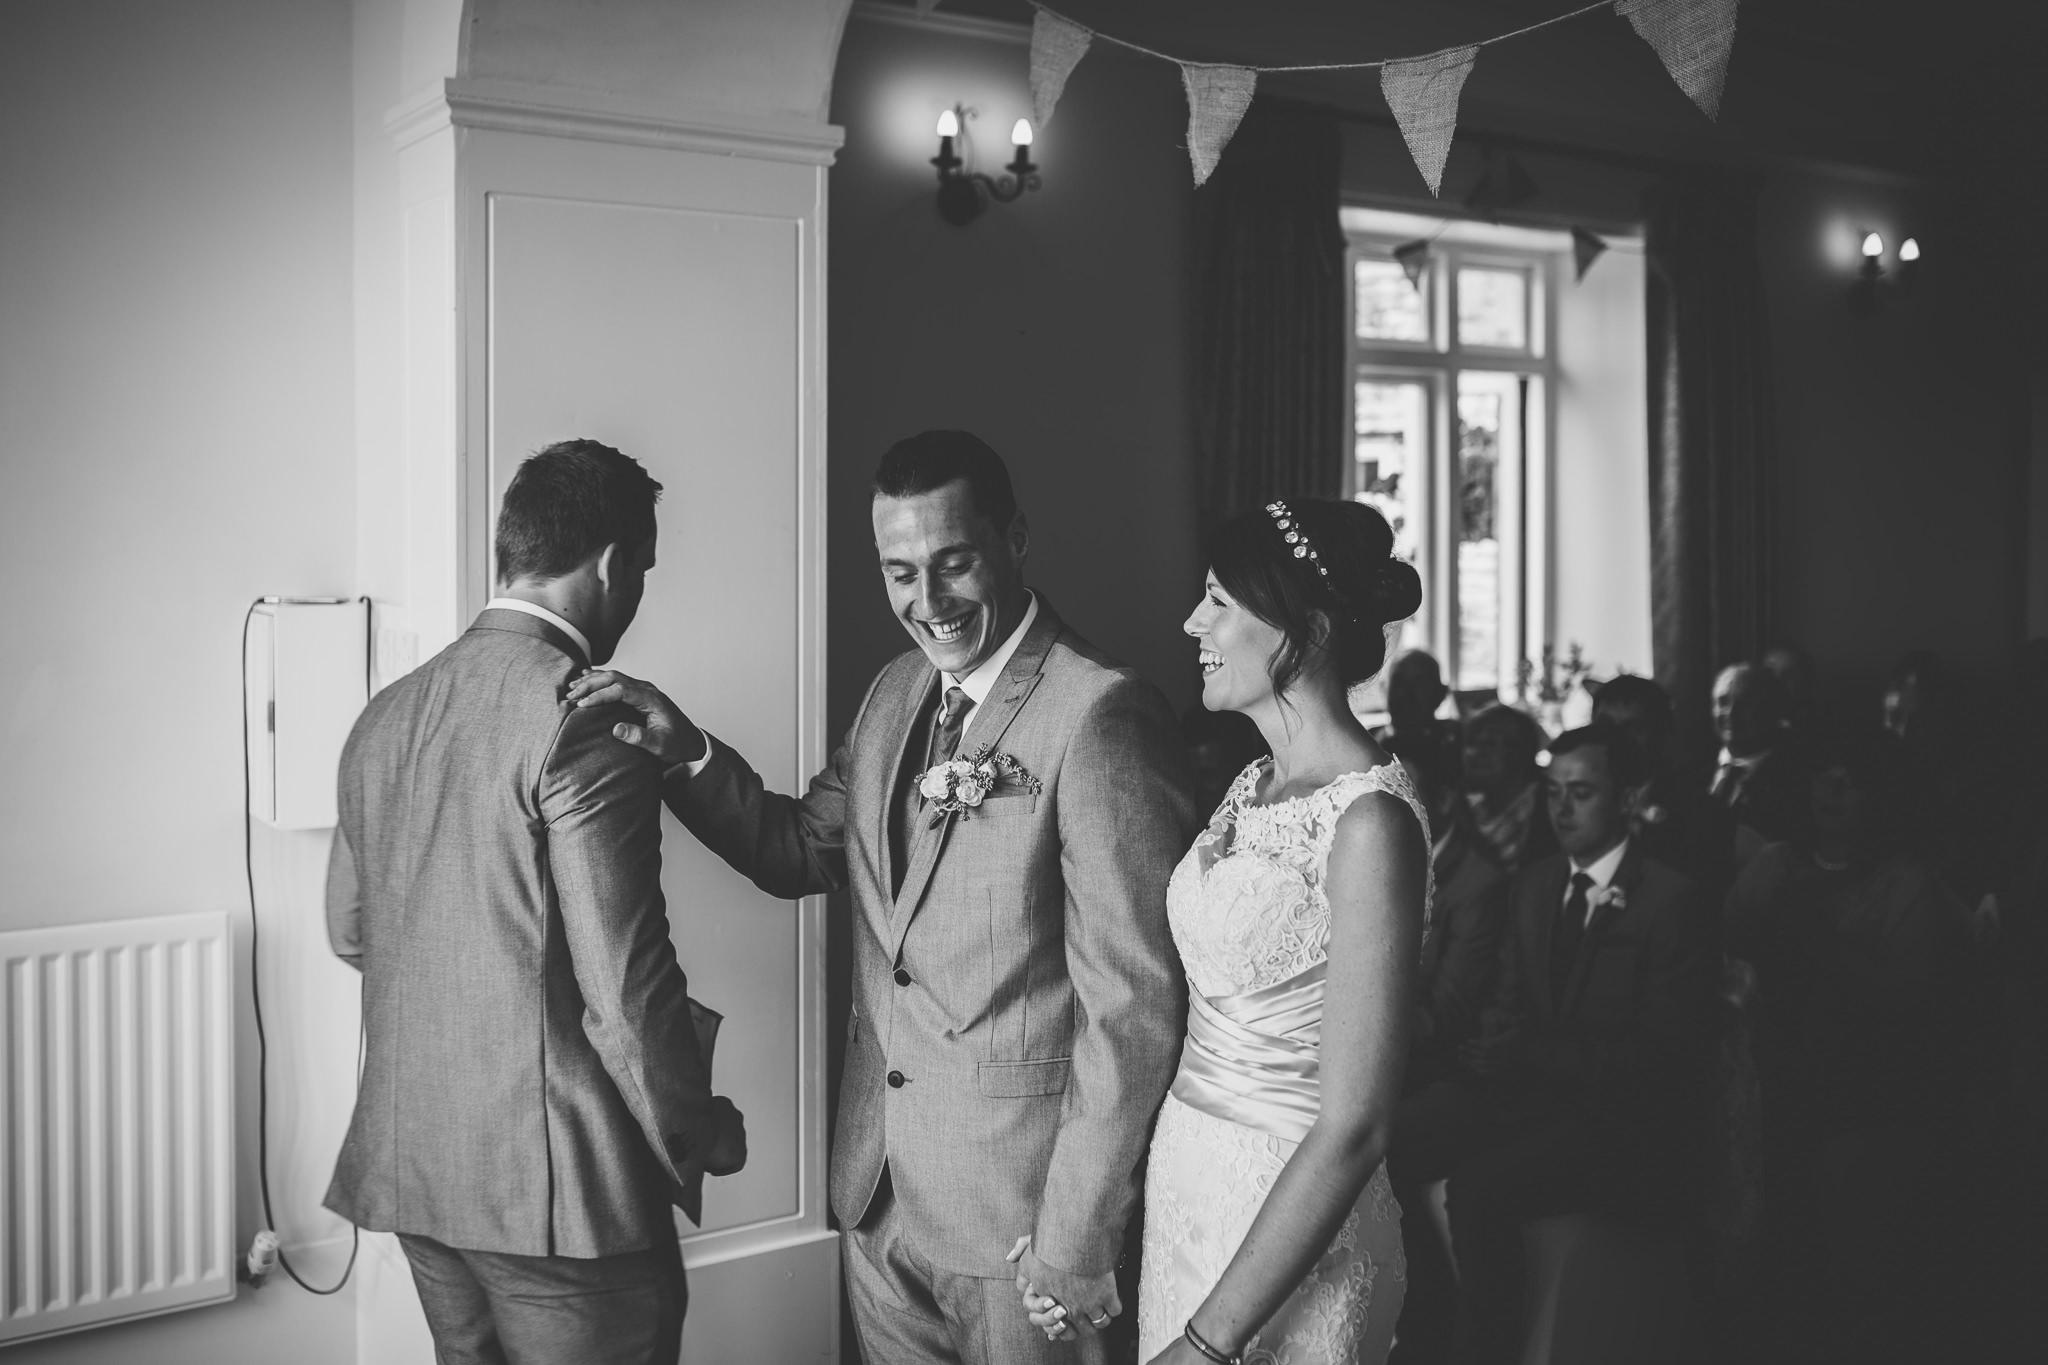 paul-marbrook-Caer-Llan-Wedding-Photographer-90046